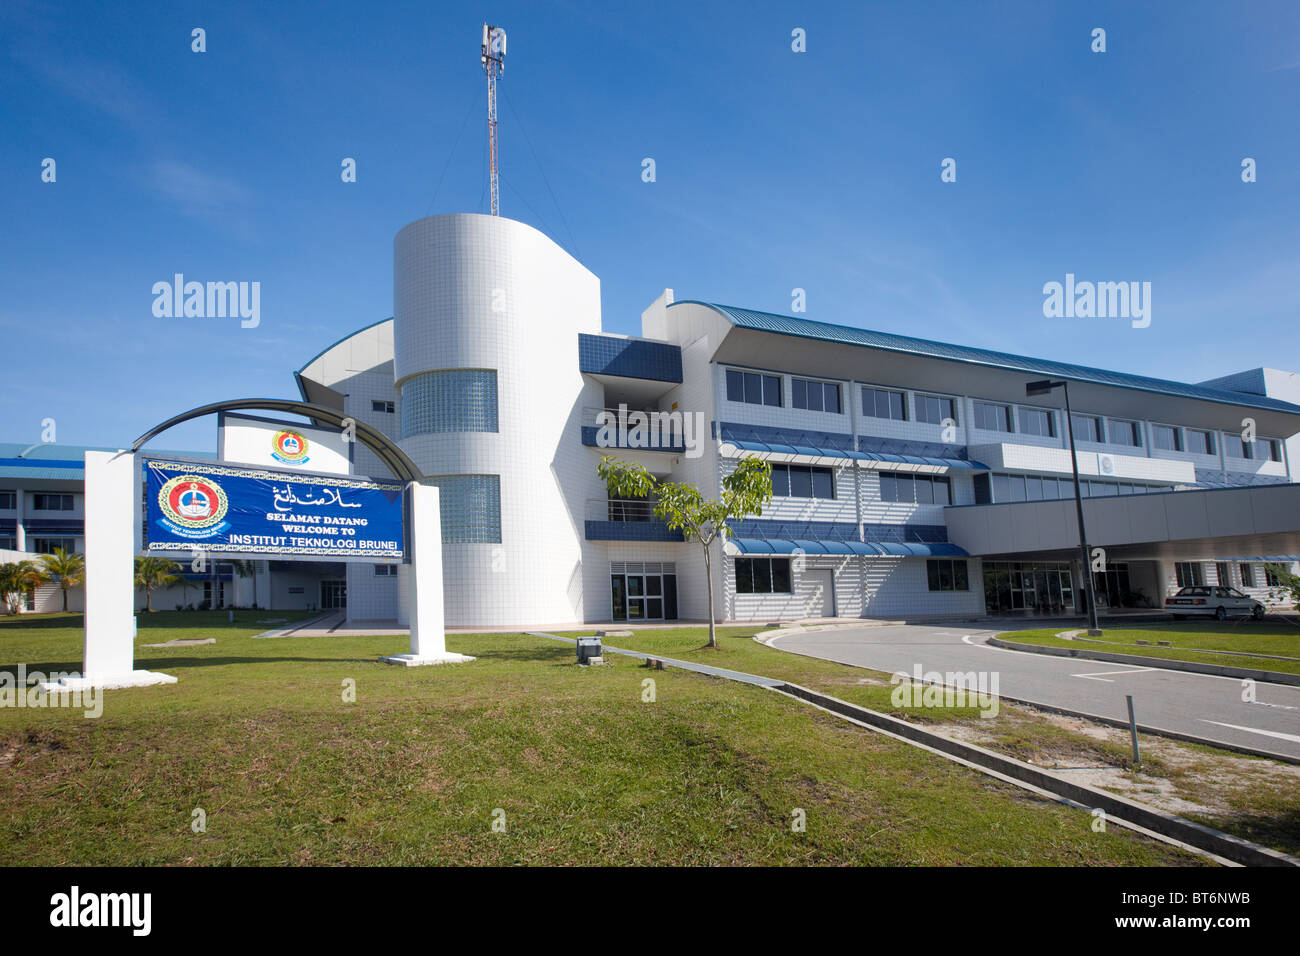 Universiti Brunei Darussalam, Gadong, Brunei - Stock Image